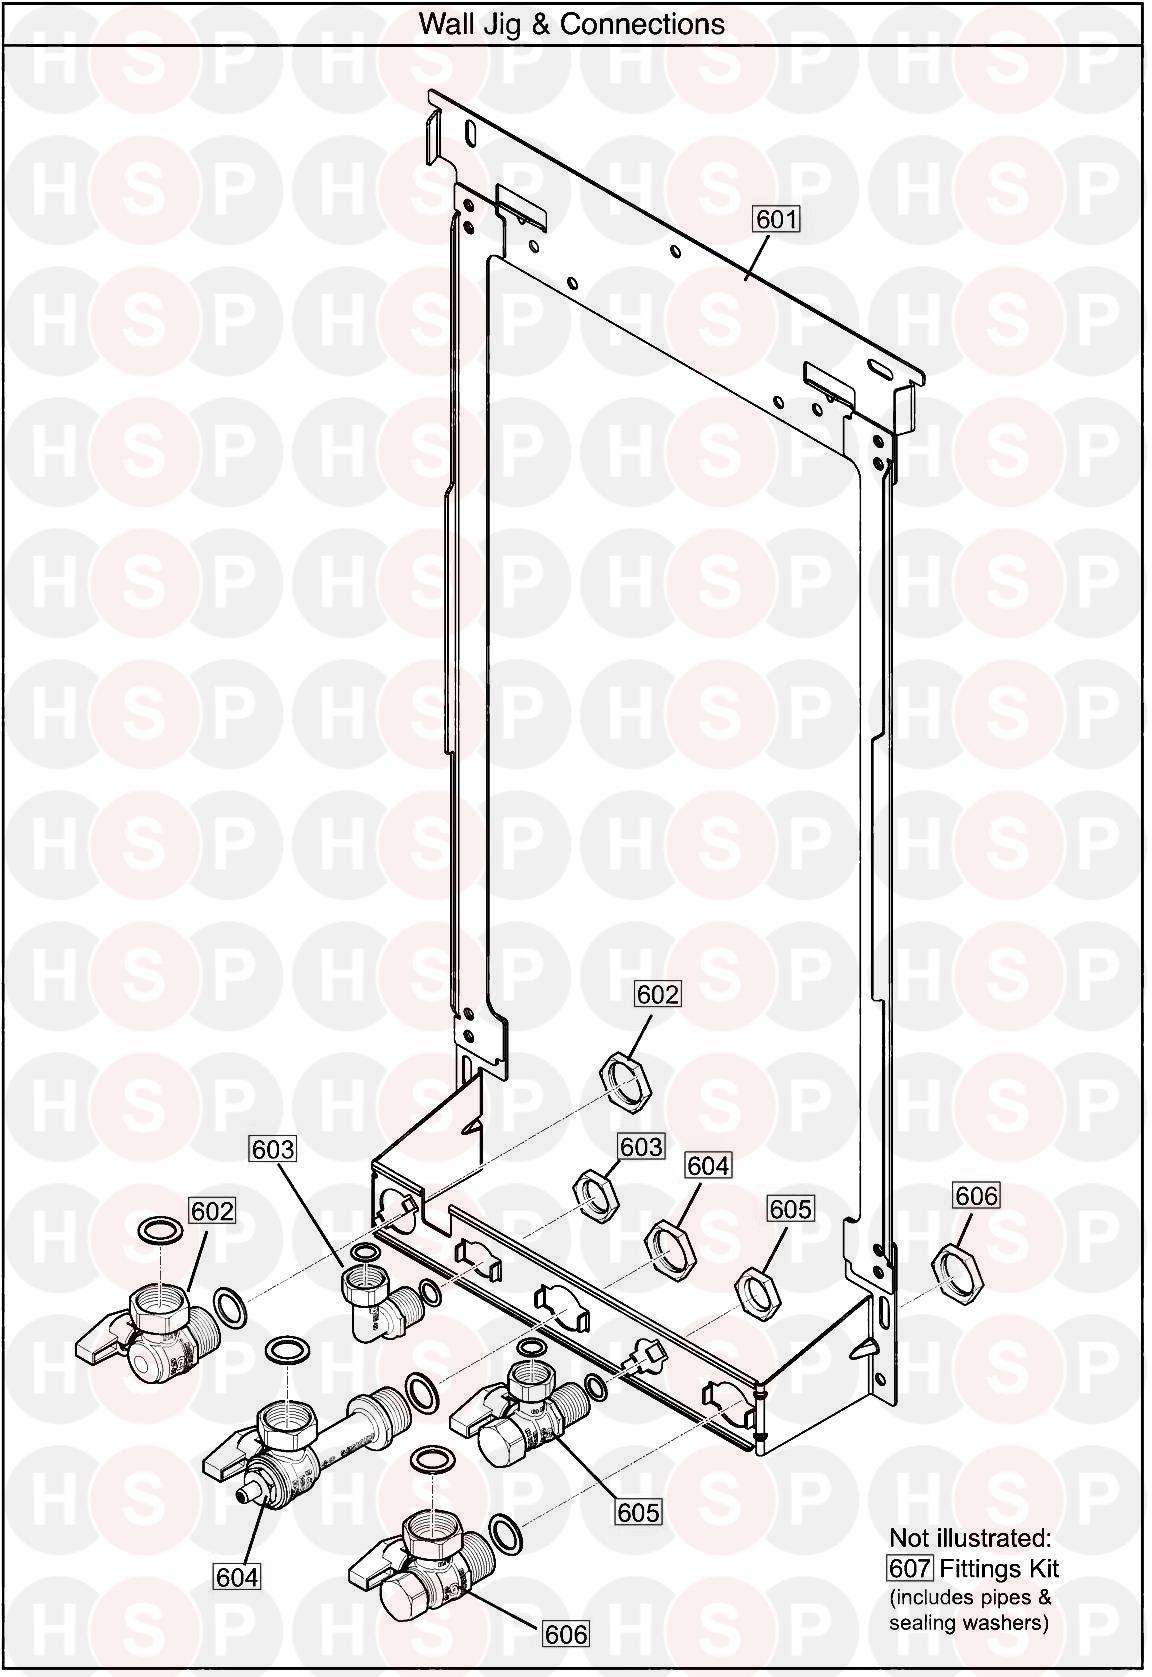 baxi ecoblue advance combi 28  wall jig  diagram